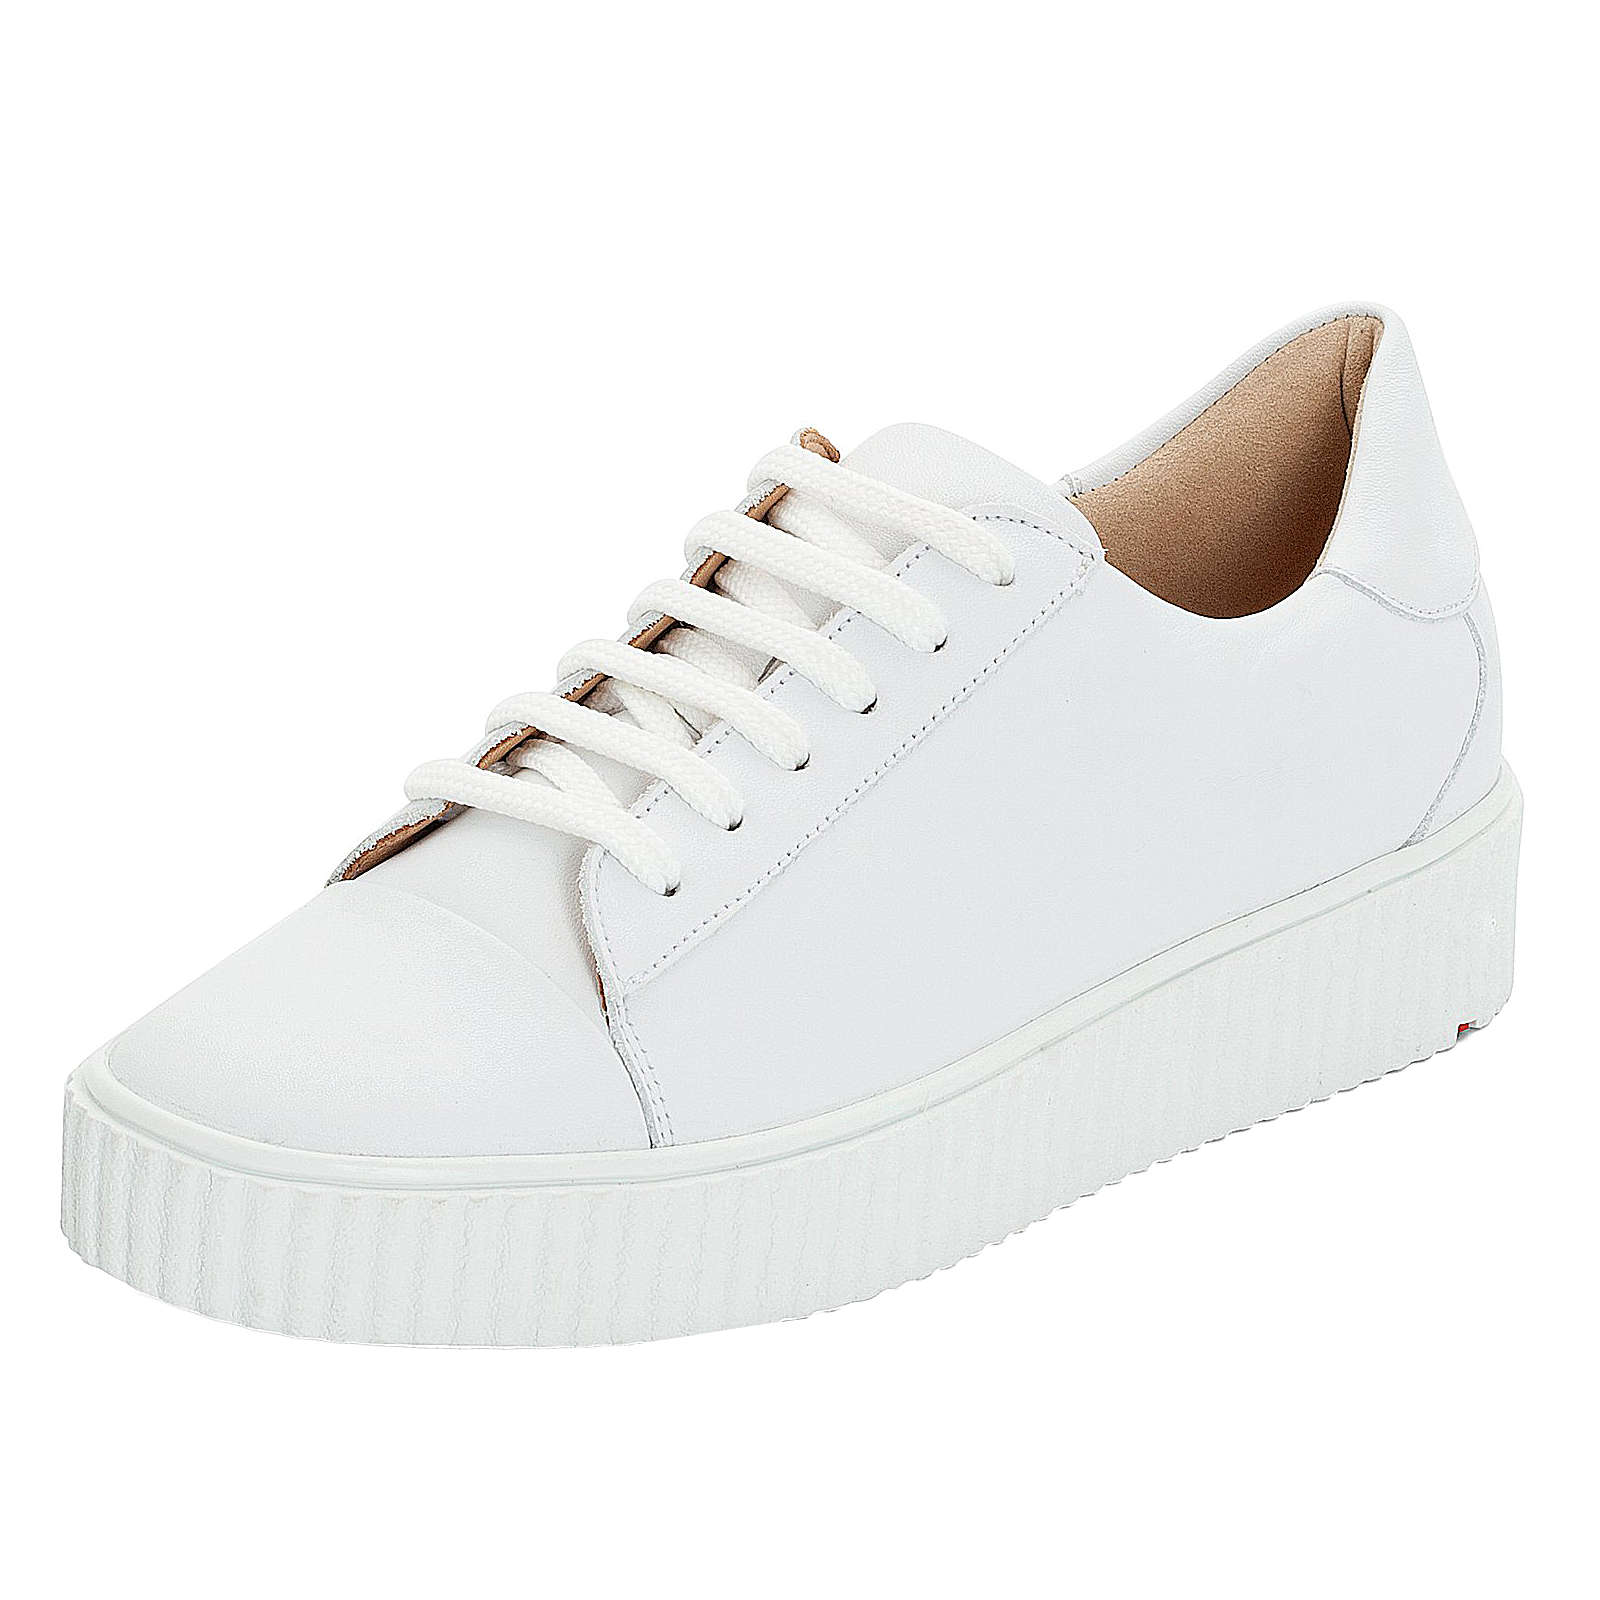 LLOYD Sneaker mit Variofußbett Sneakers Low weiß Damen Gr. 41